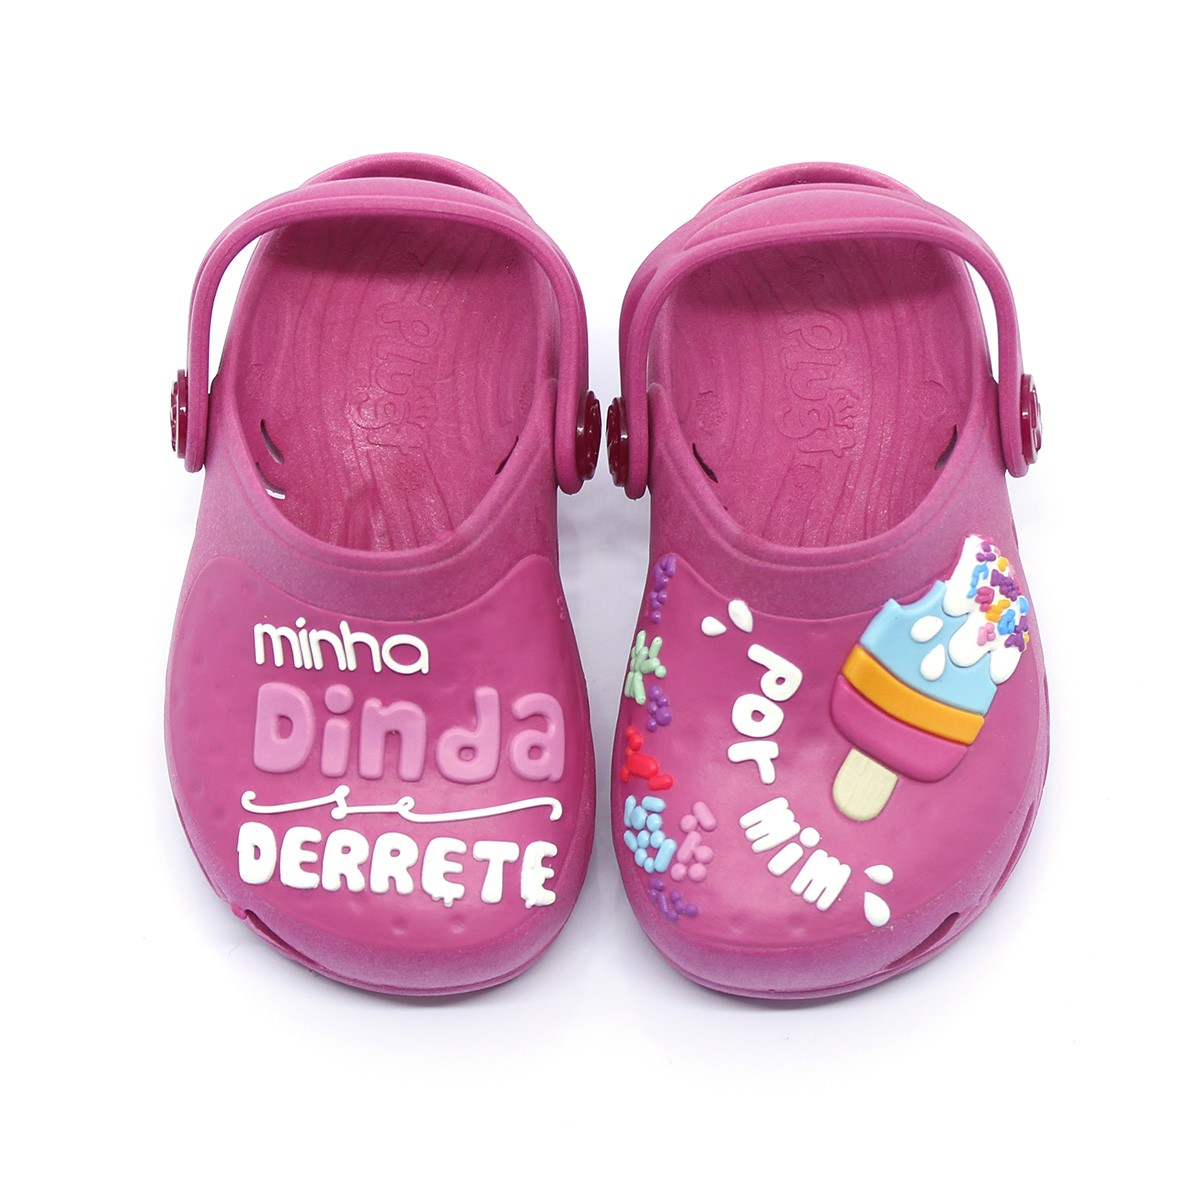 Babuche Plugt Ventor Baby Madrinha Dinda Pink